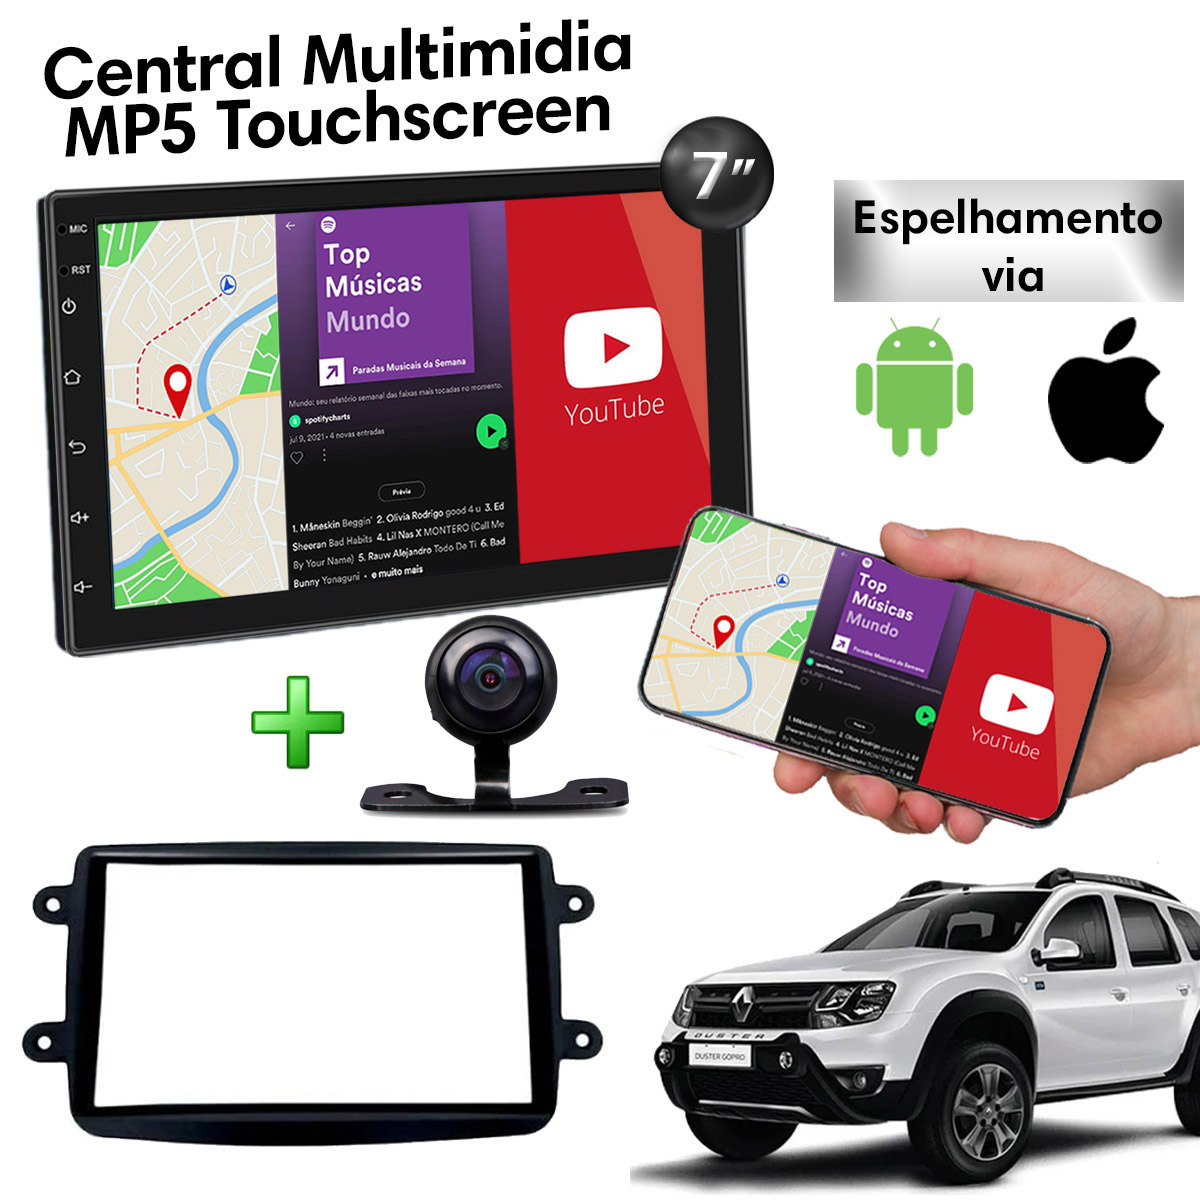 Central Multimidia com Renault Duster Mp5 Bluetooth Usb Touchscreen 7 Polegadas 2 Din Atacado